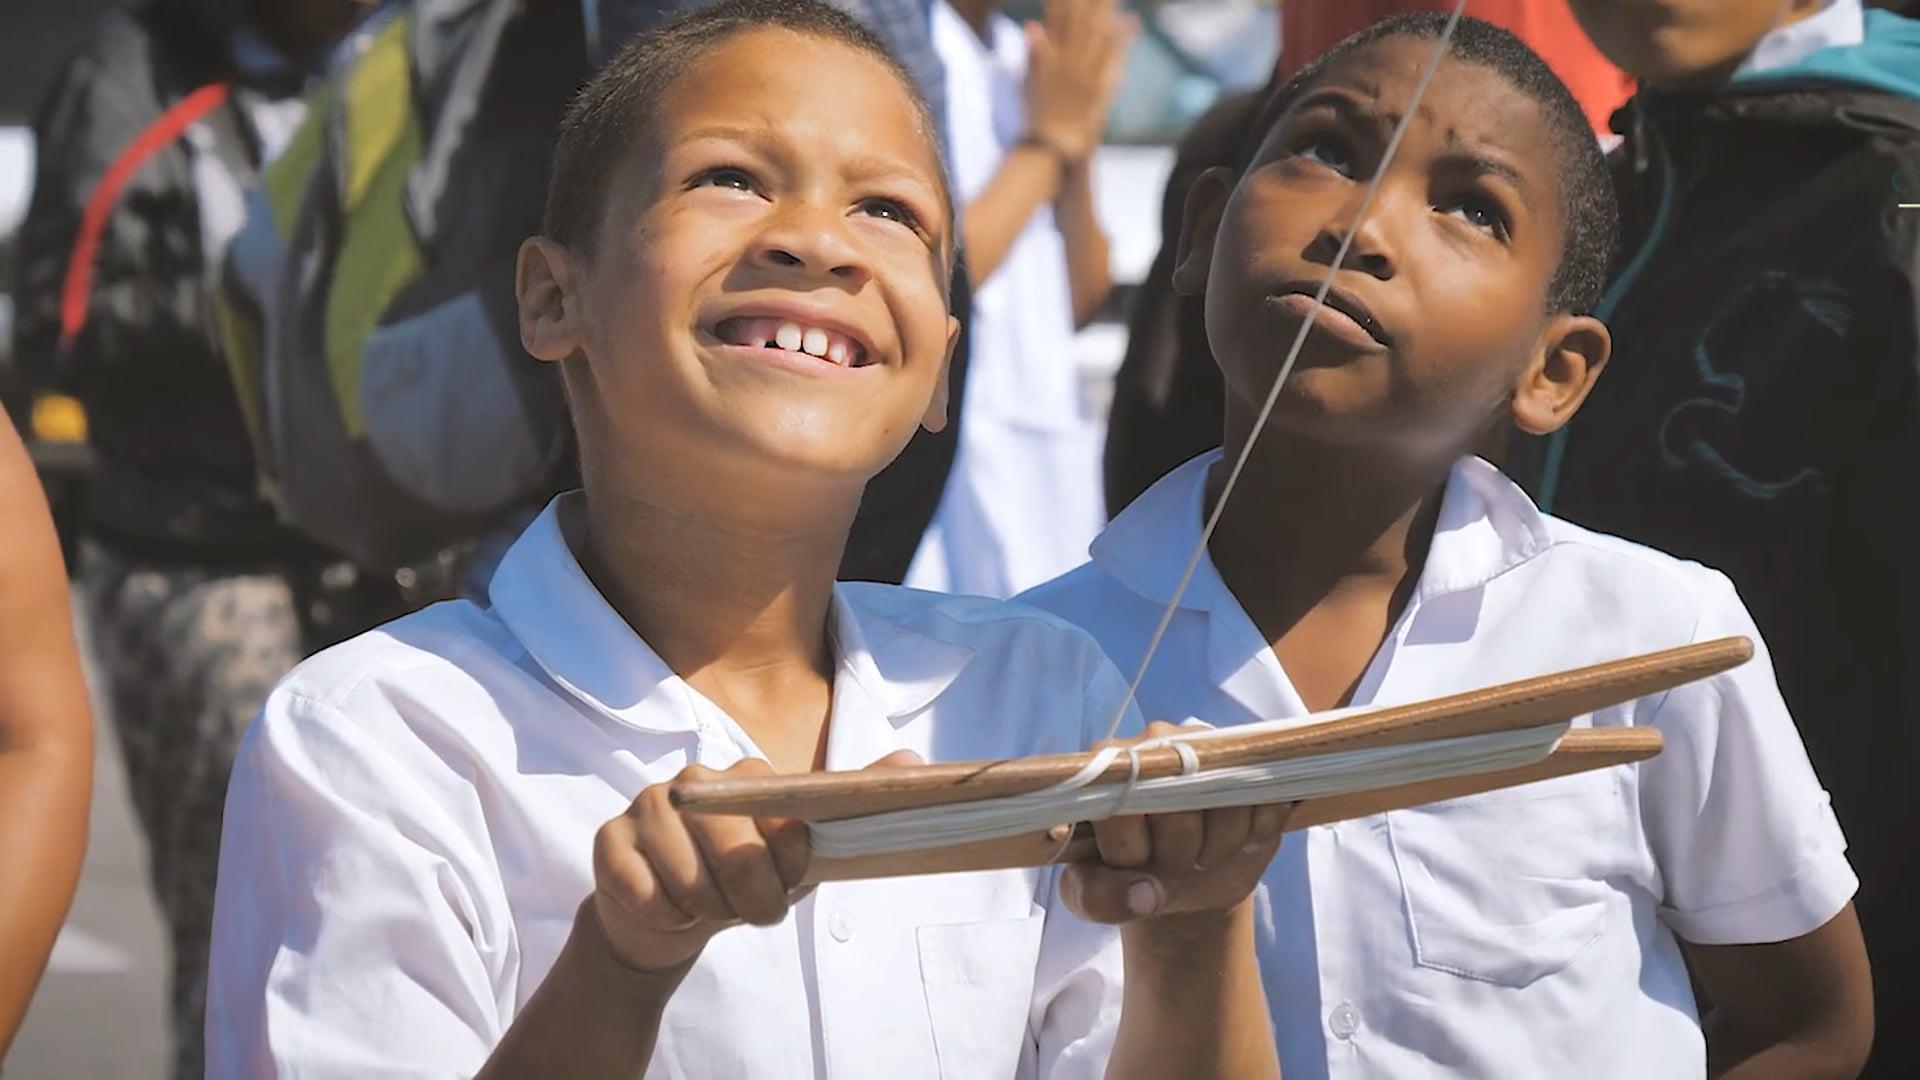 Cape Mental Health and the kite festival